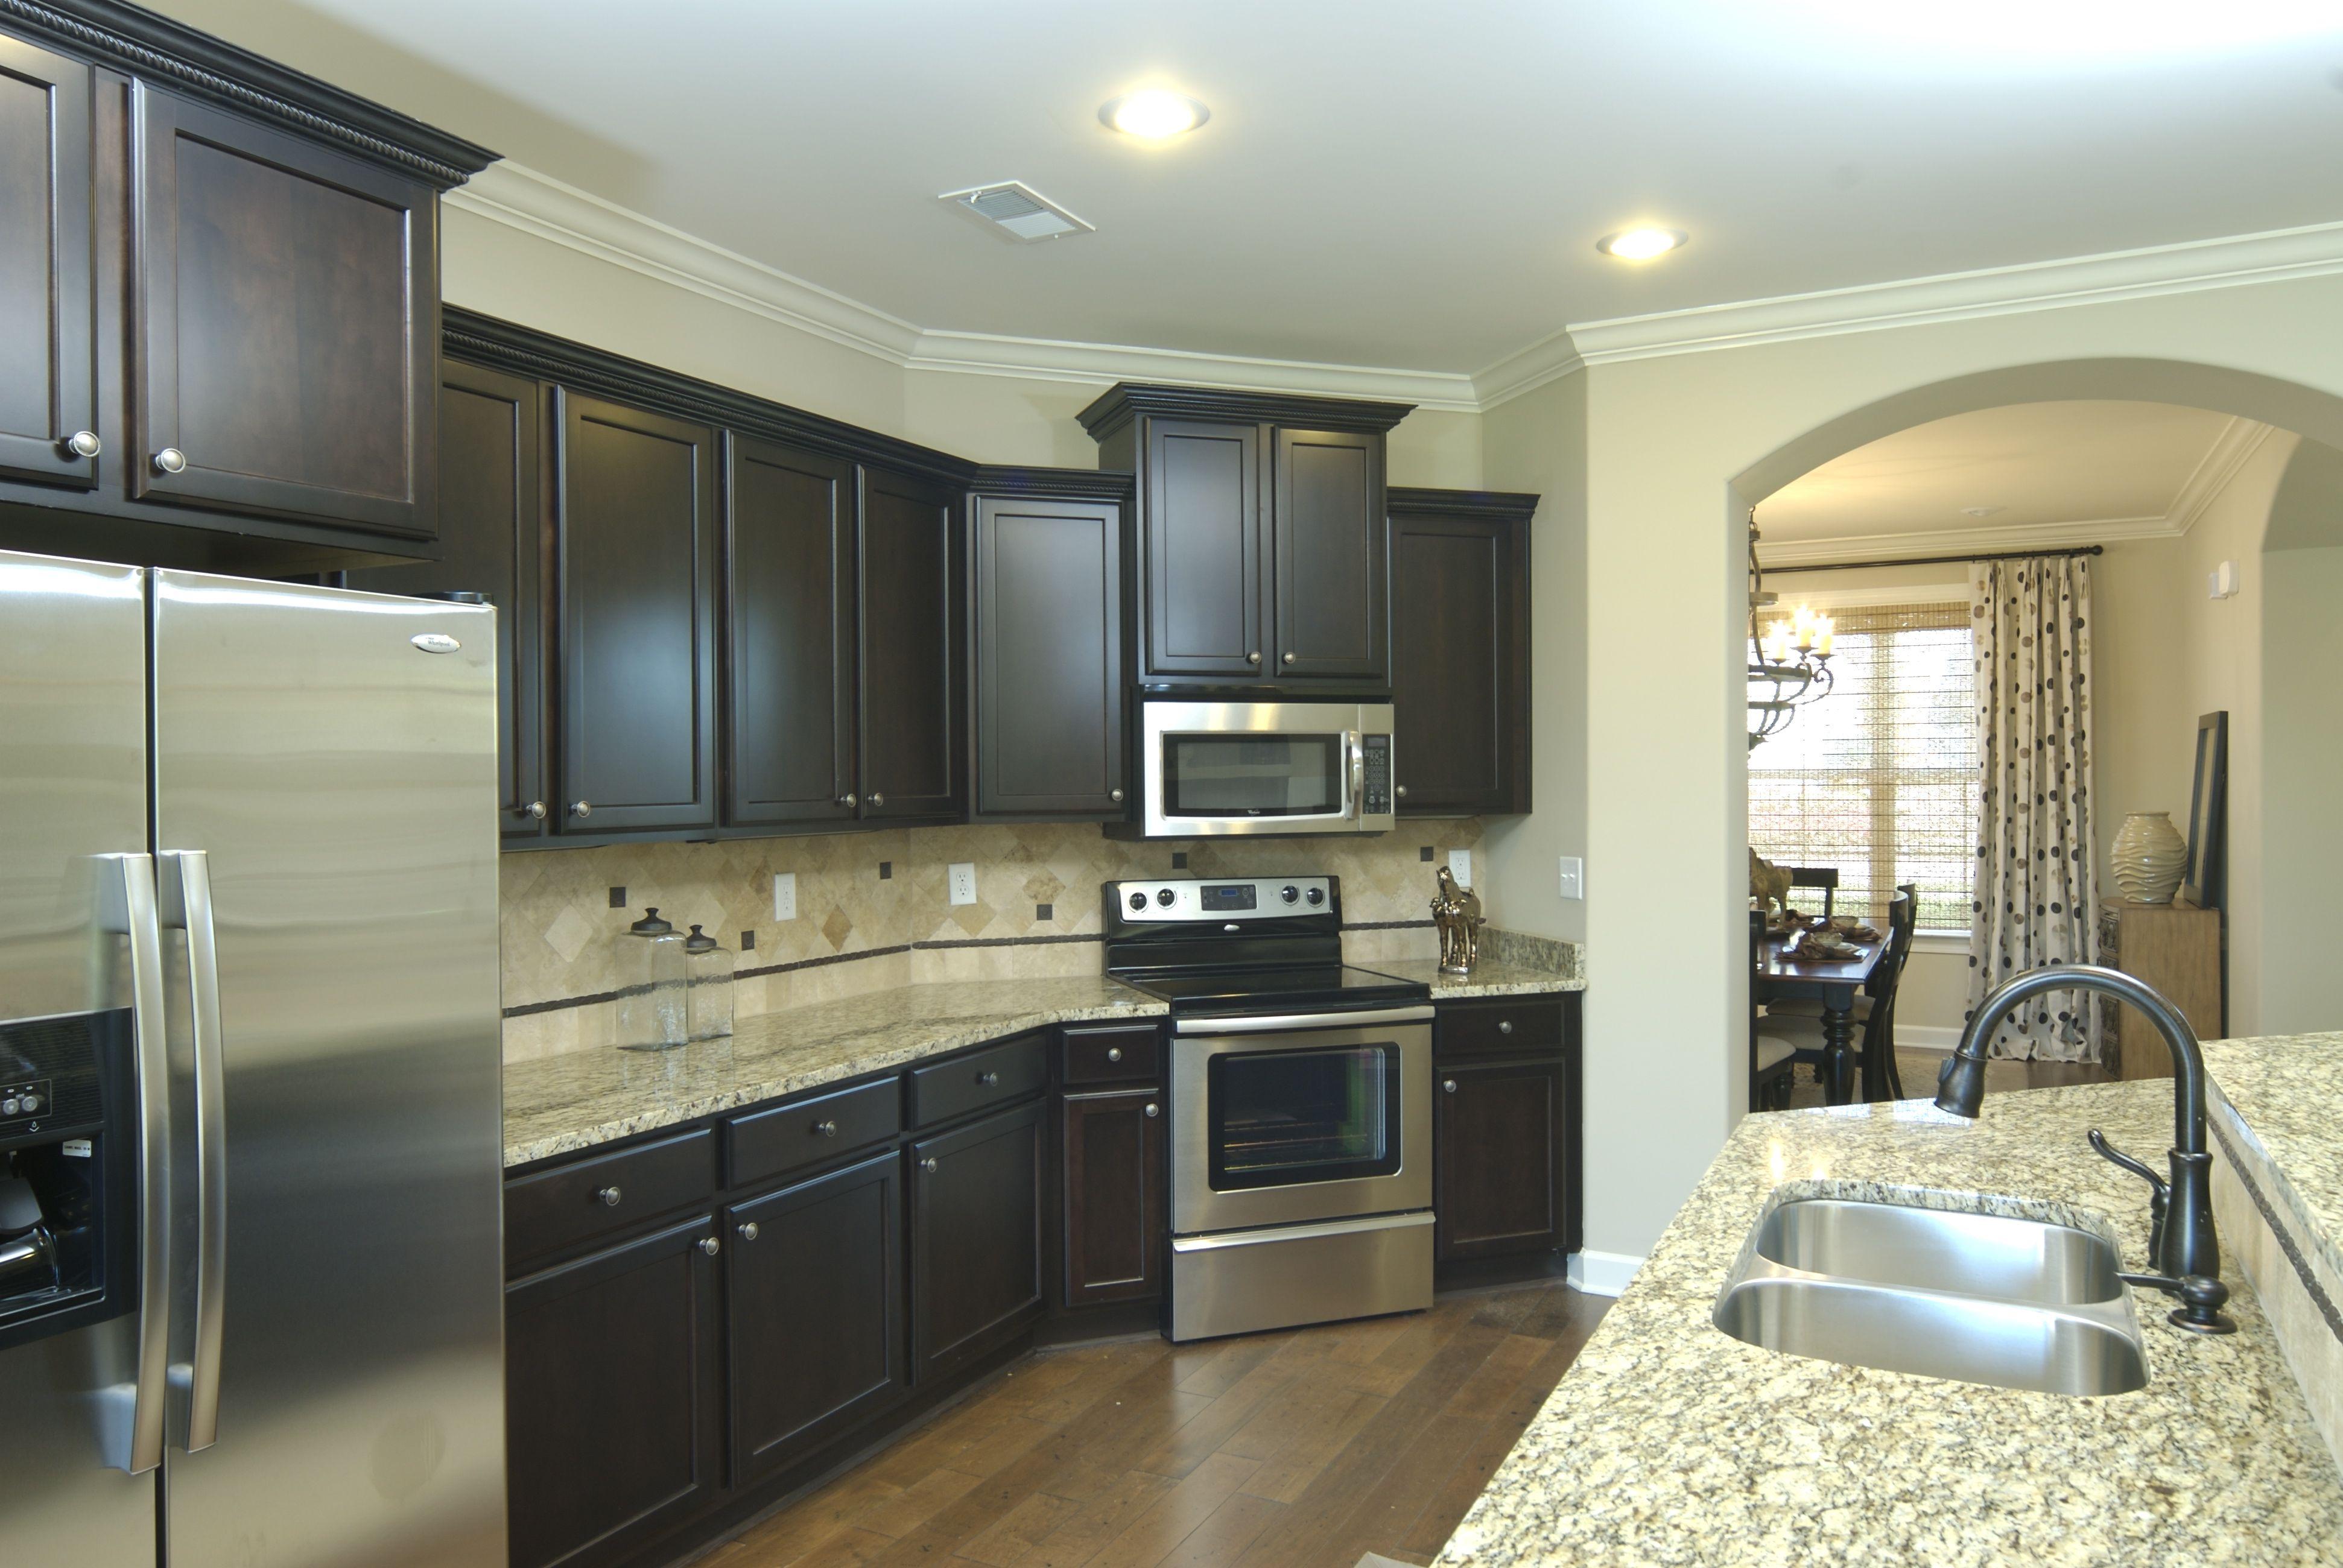 Regency Homebuilders : Open Concept Living And Kitchen, Dark Wood Cabinets,  Travertine Backsplash,